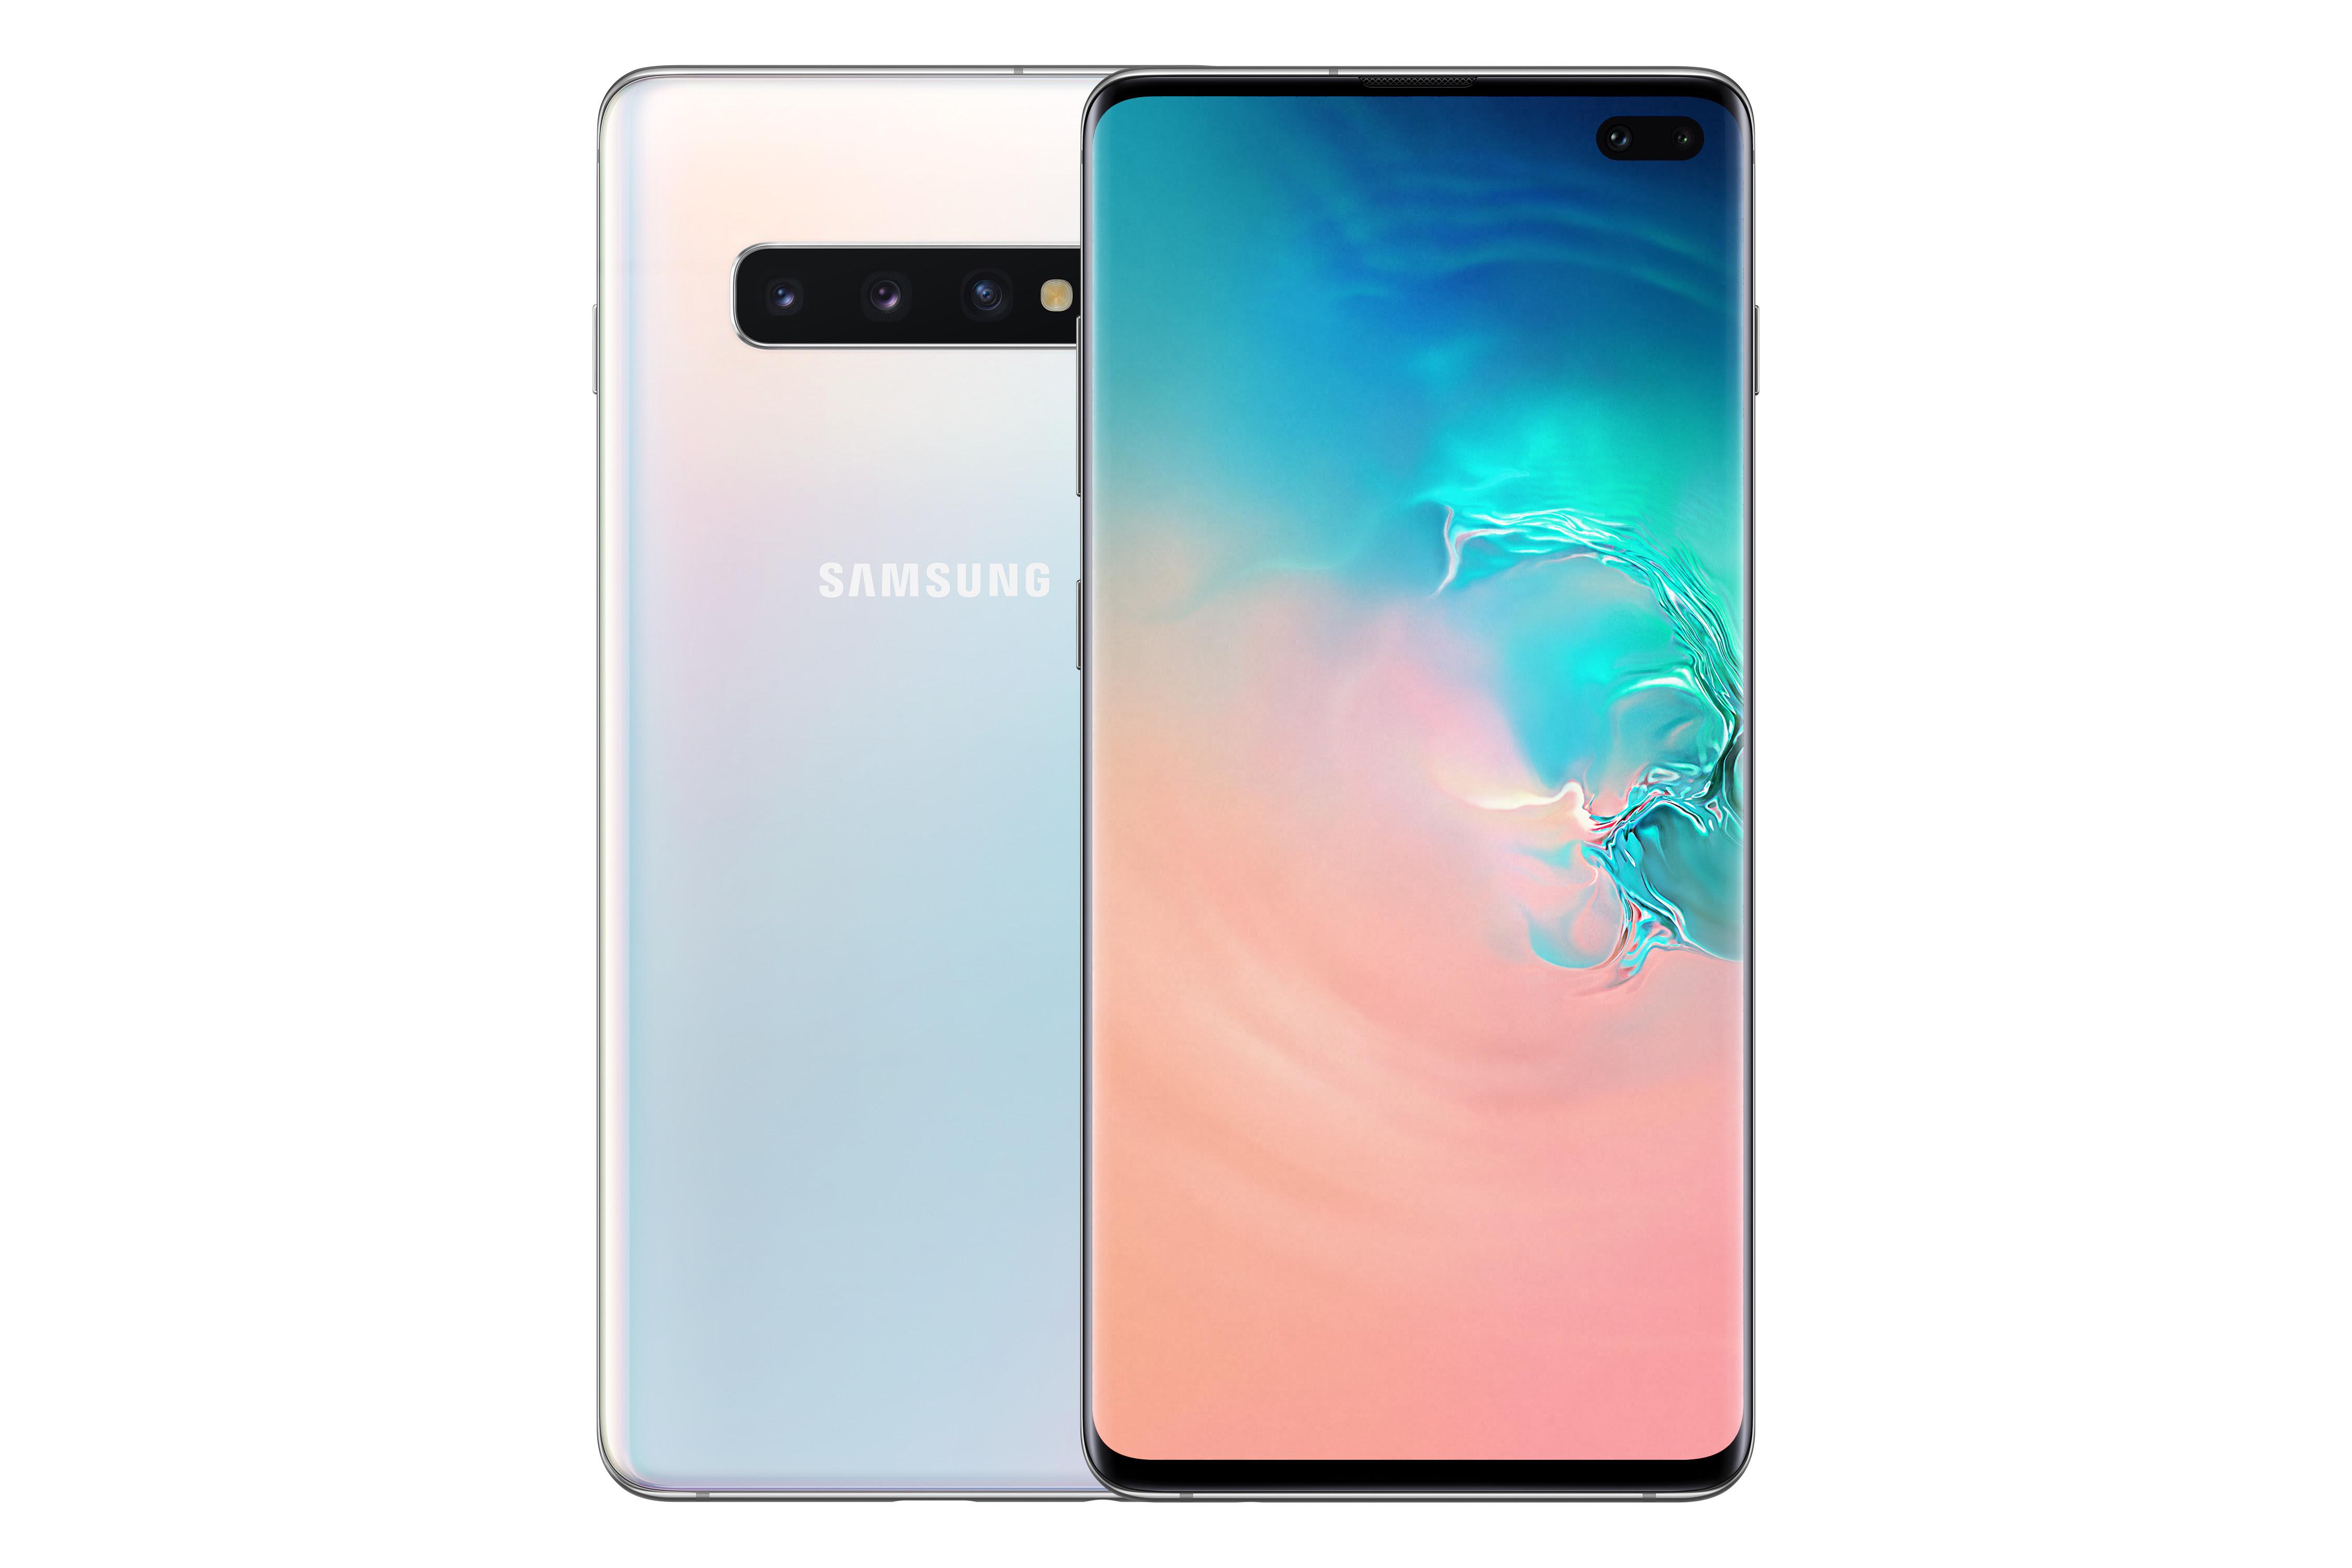 Tiedote: Samsung julkaisi uuden Galaxy S10:n